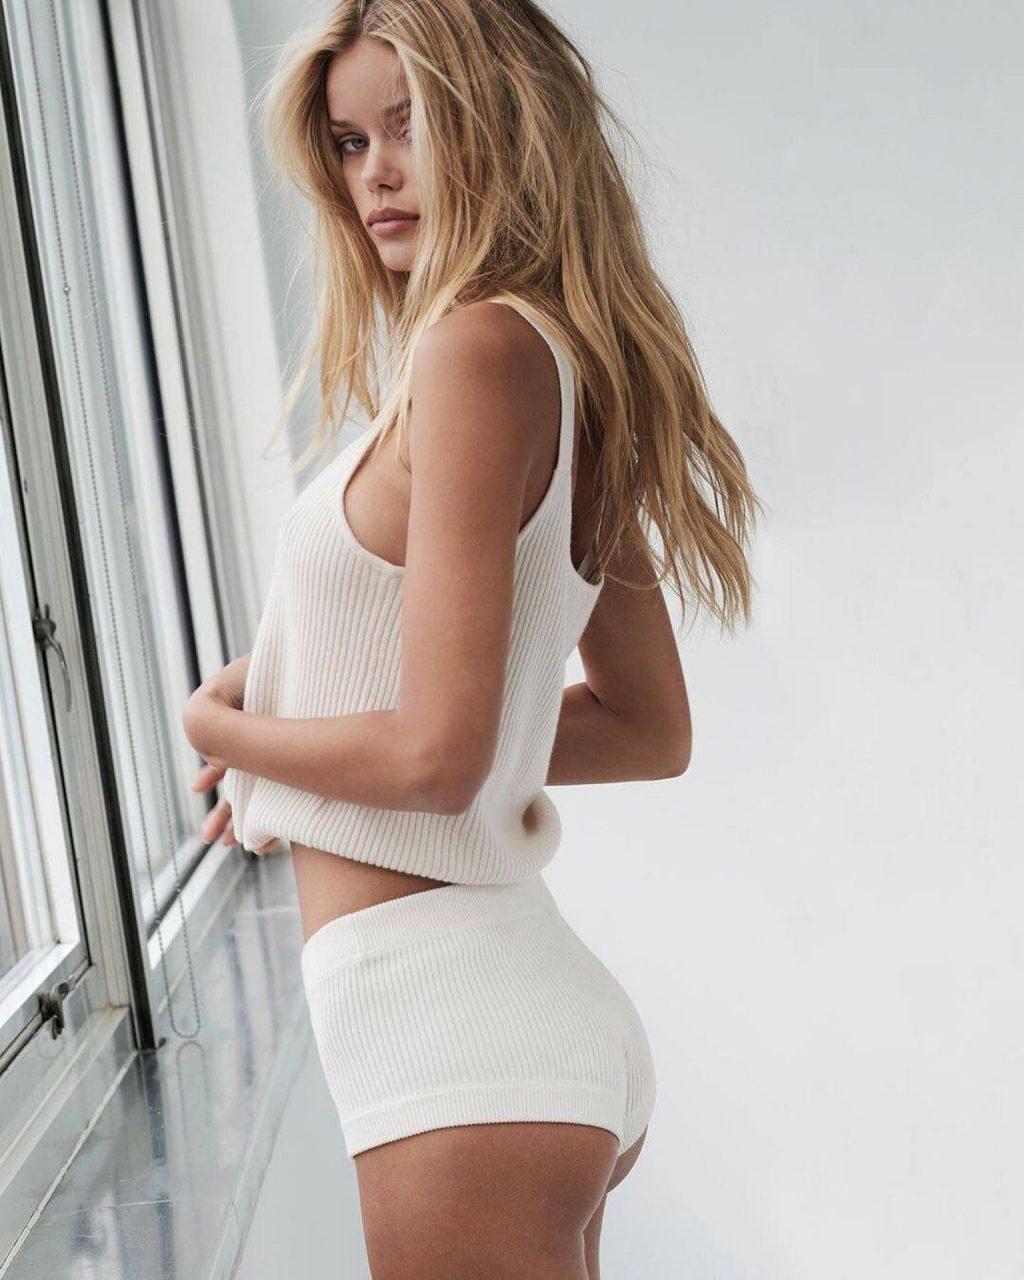 Frida Aasen Topless